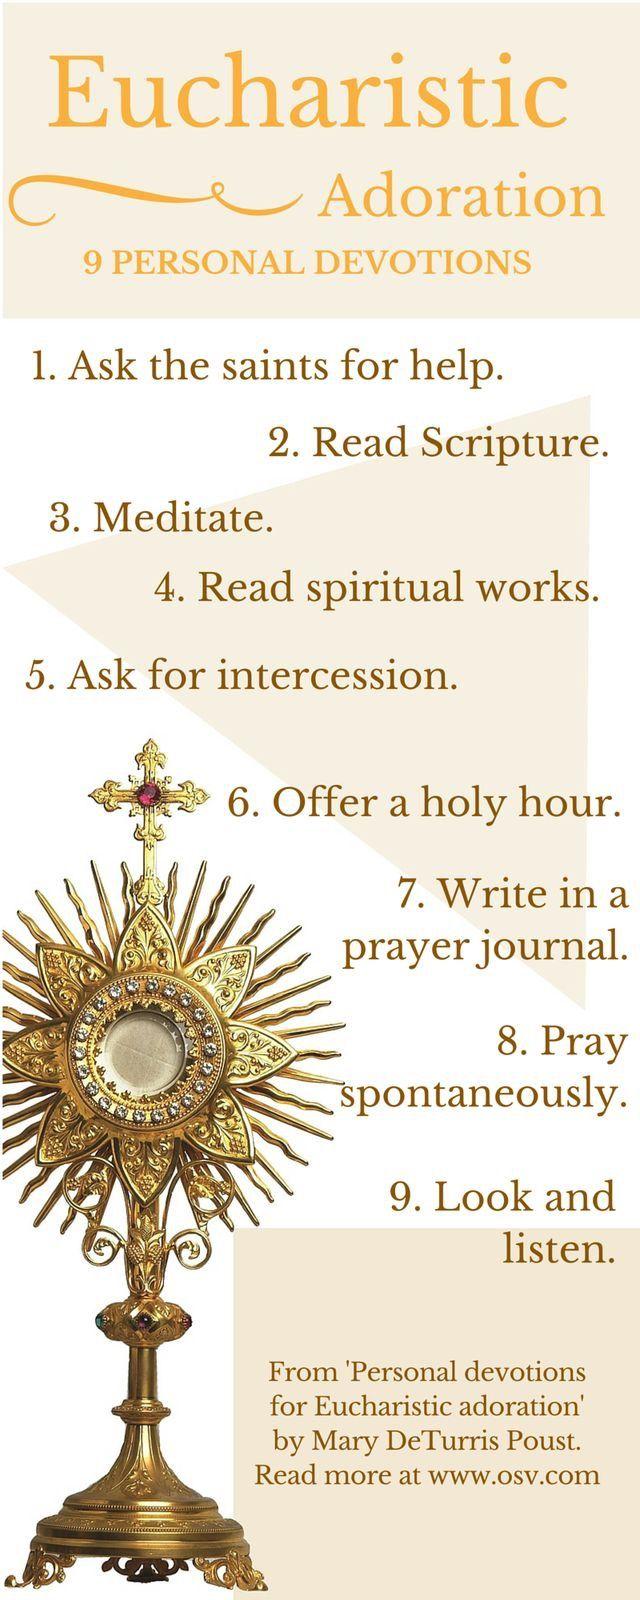 #Eucharistic #Adoration #Pray #Faith